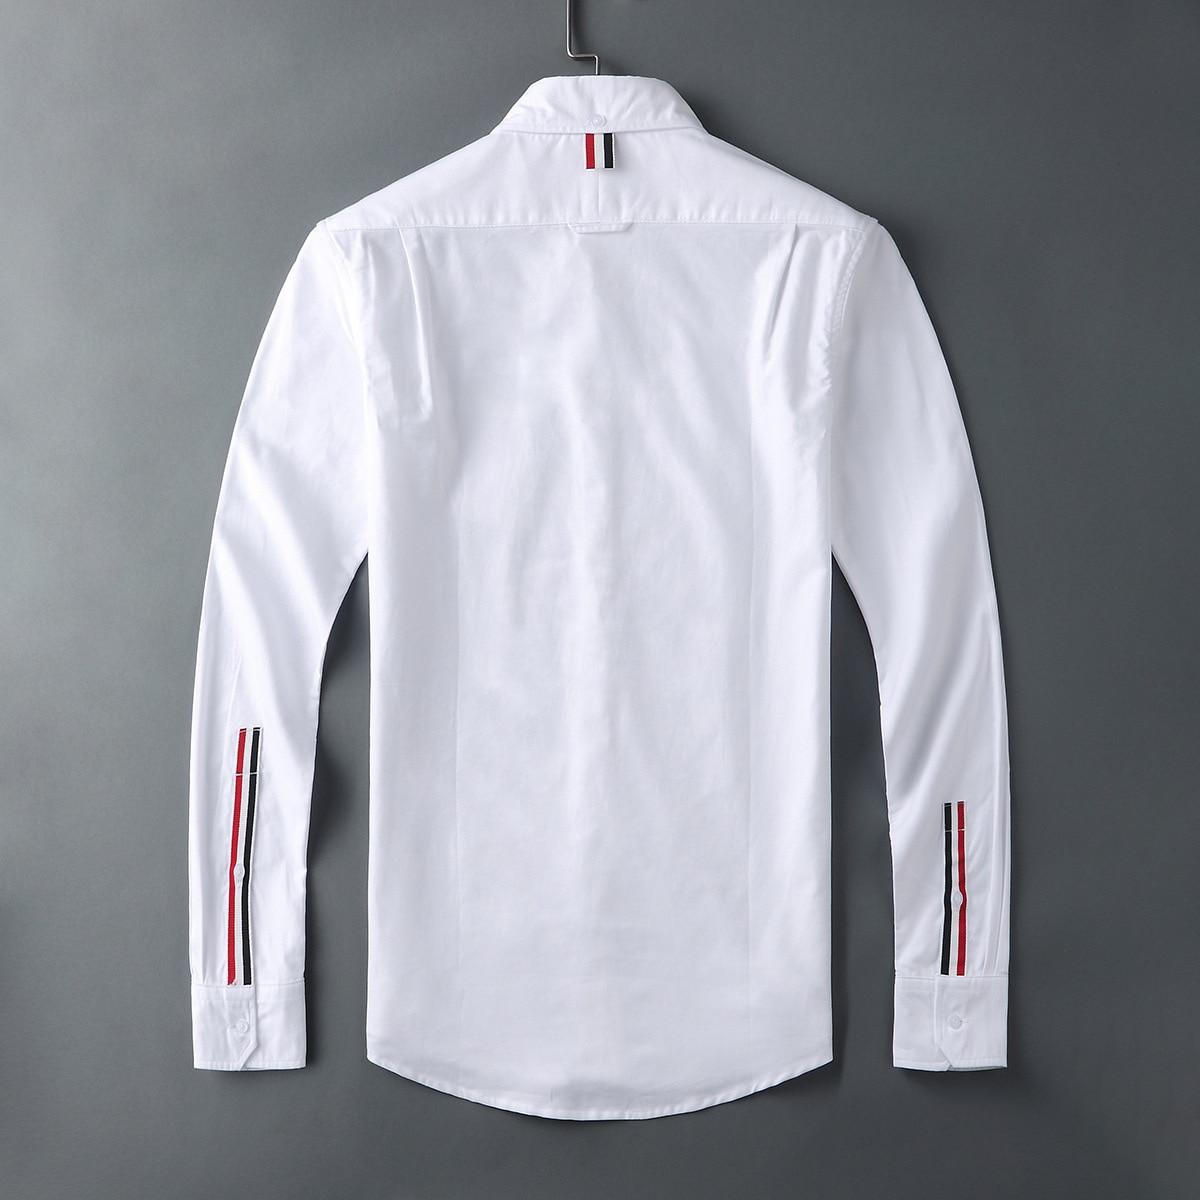 2021 Fashion Brand Shirts Men Slim White Long Sleeve Casual Shirt Turn Down Collar Oxford Cuff Ribbons Shirts for Men